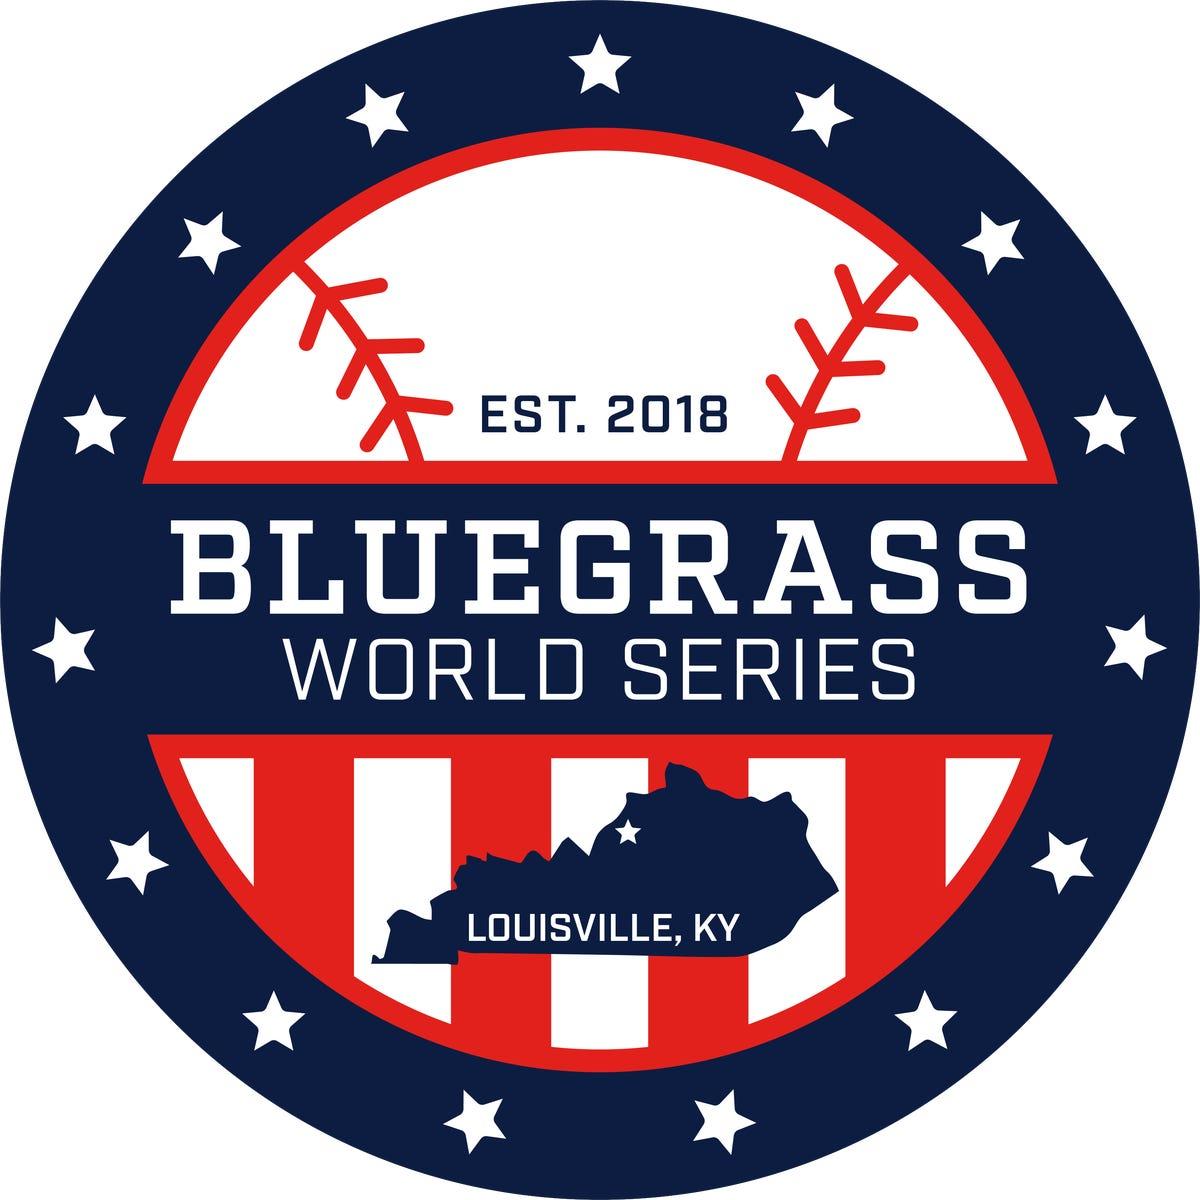 Bluegrass World Series: Schedule, tickets, roster of players